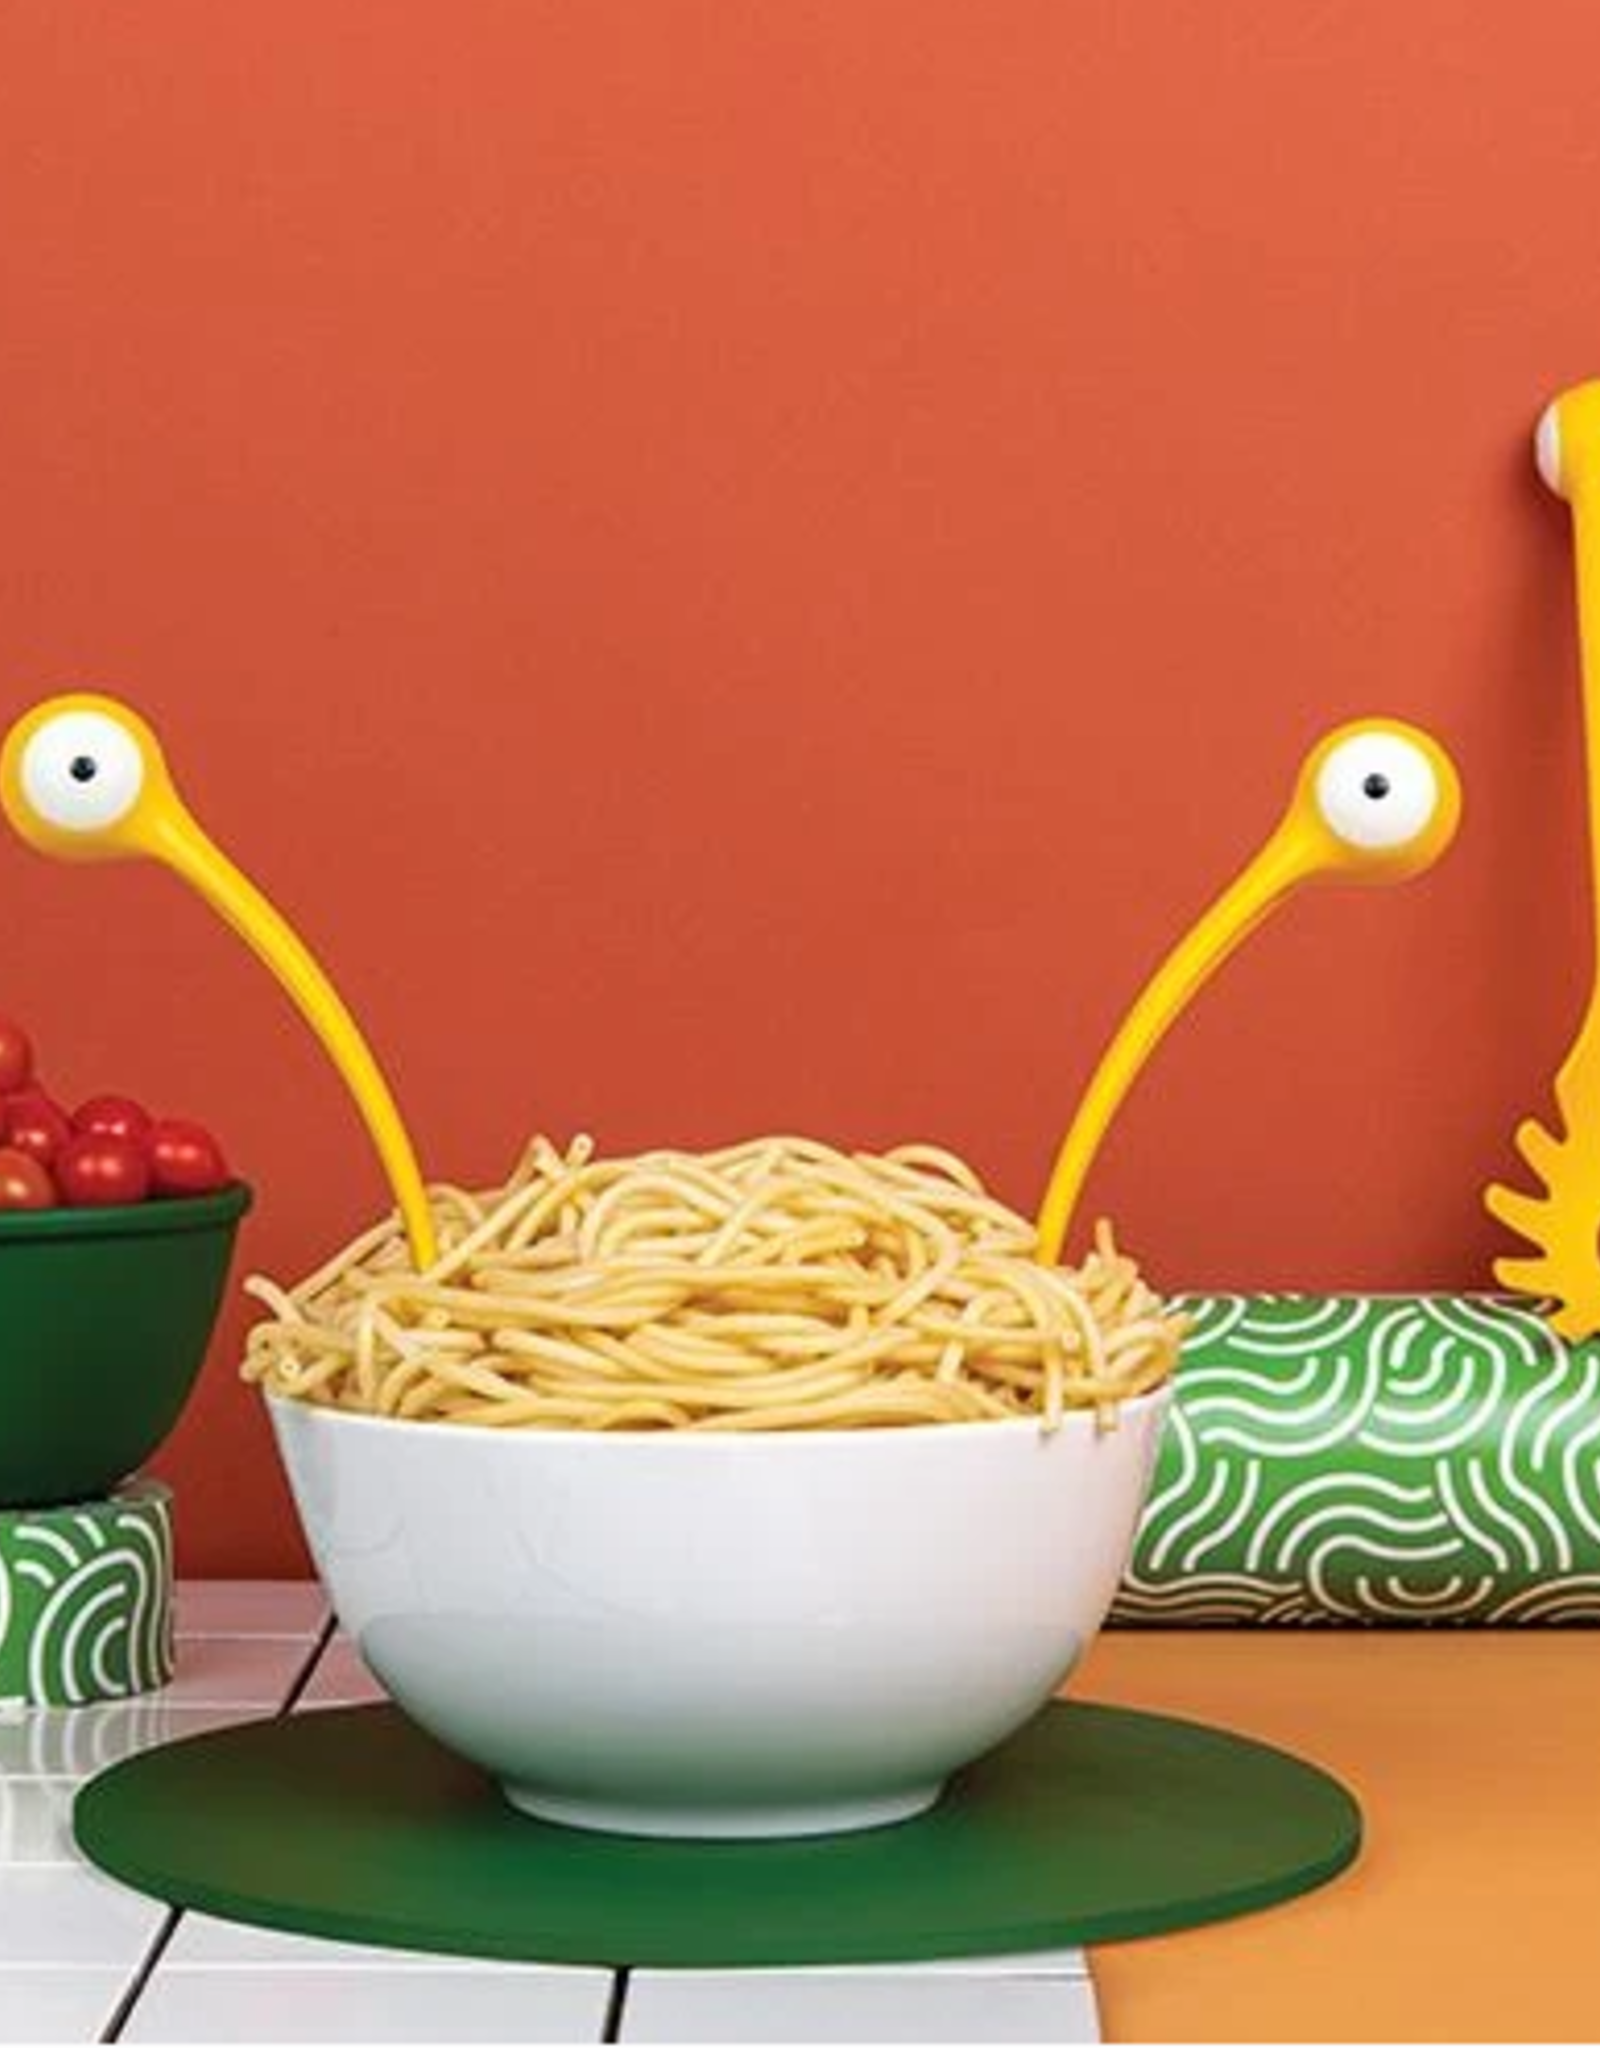 abodee Pasta monsters servers